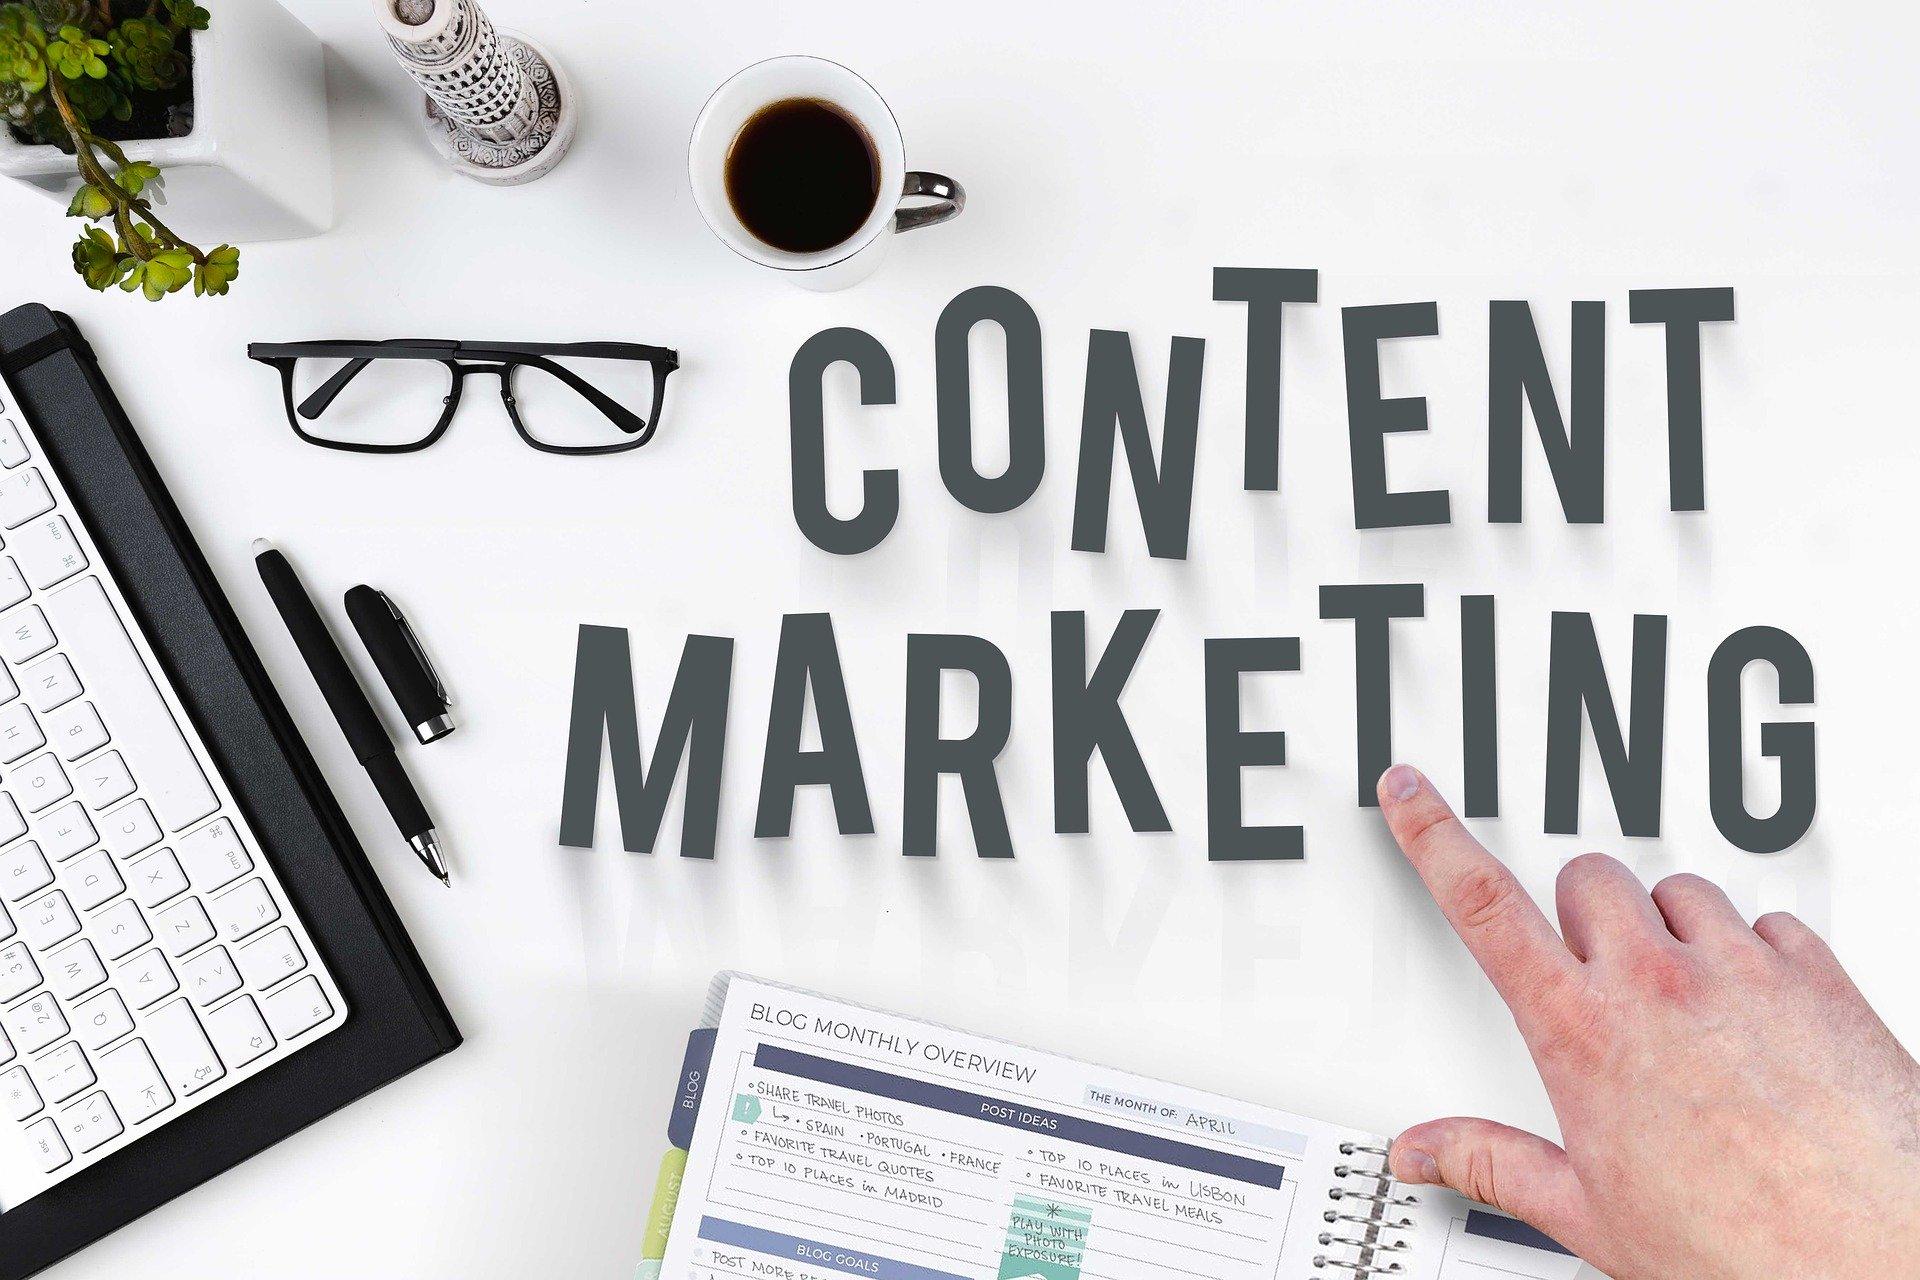 ECサイトの集客に有効なコンテンツマーケティングのメリットや方法を解説した記事内のイメージ画像です。